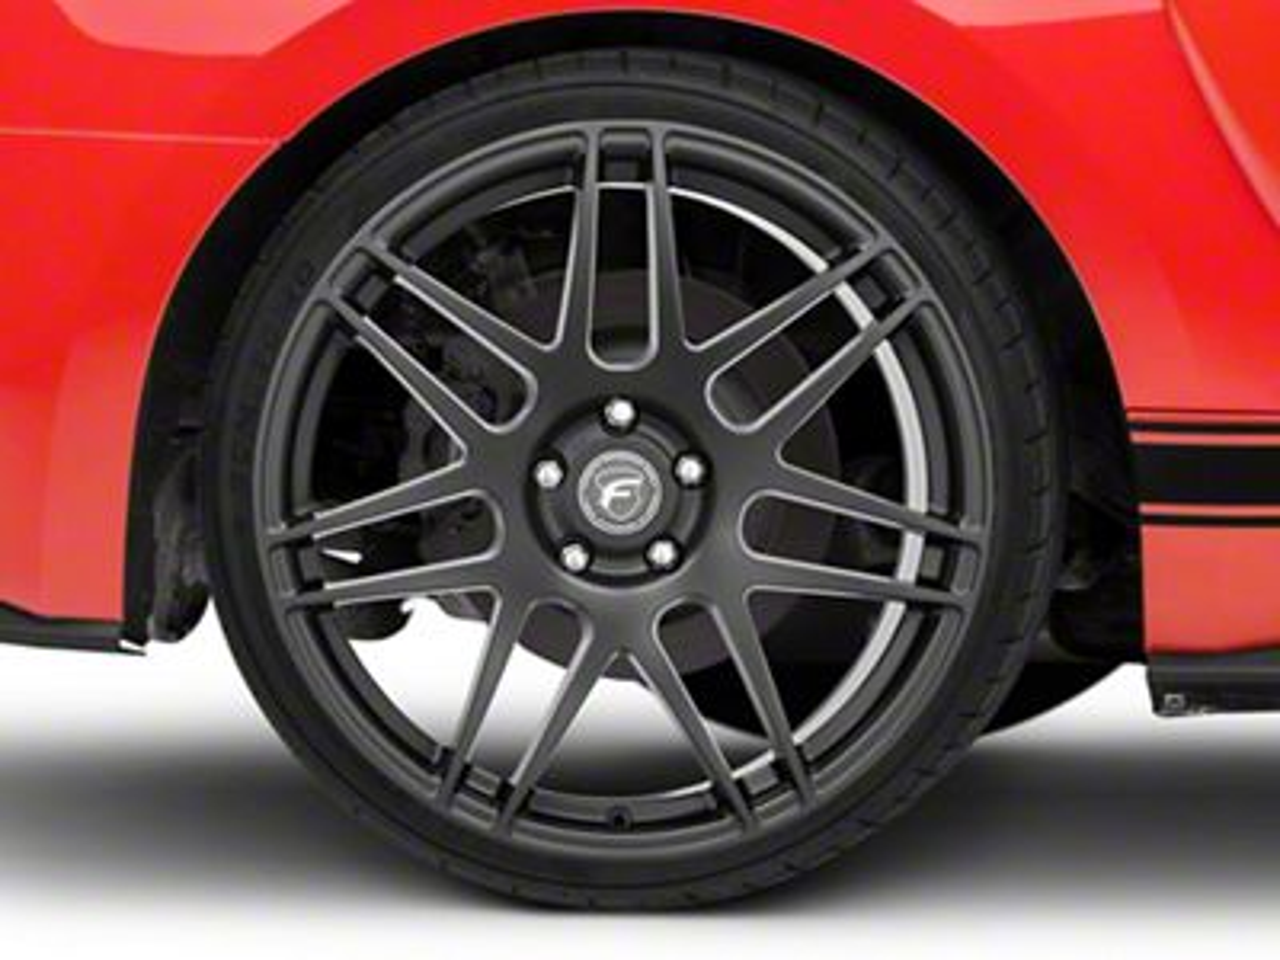 Forgestar F14 Monoblock Deep Concave Monoblock Matte Black Wheel - 20x11 (15-19 GT, EcoBoost, V6)